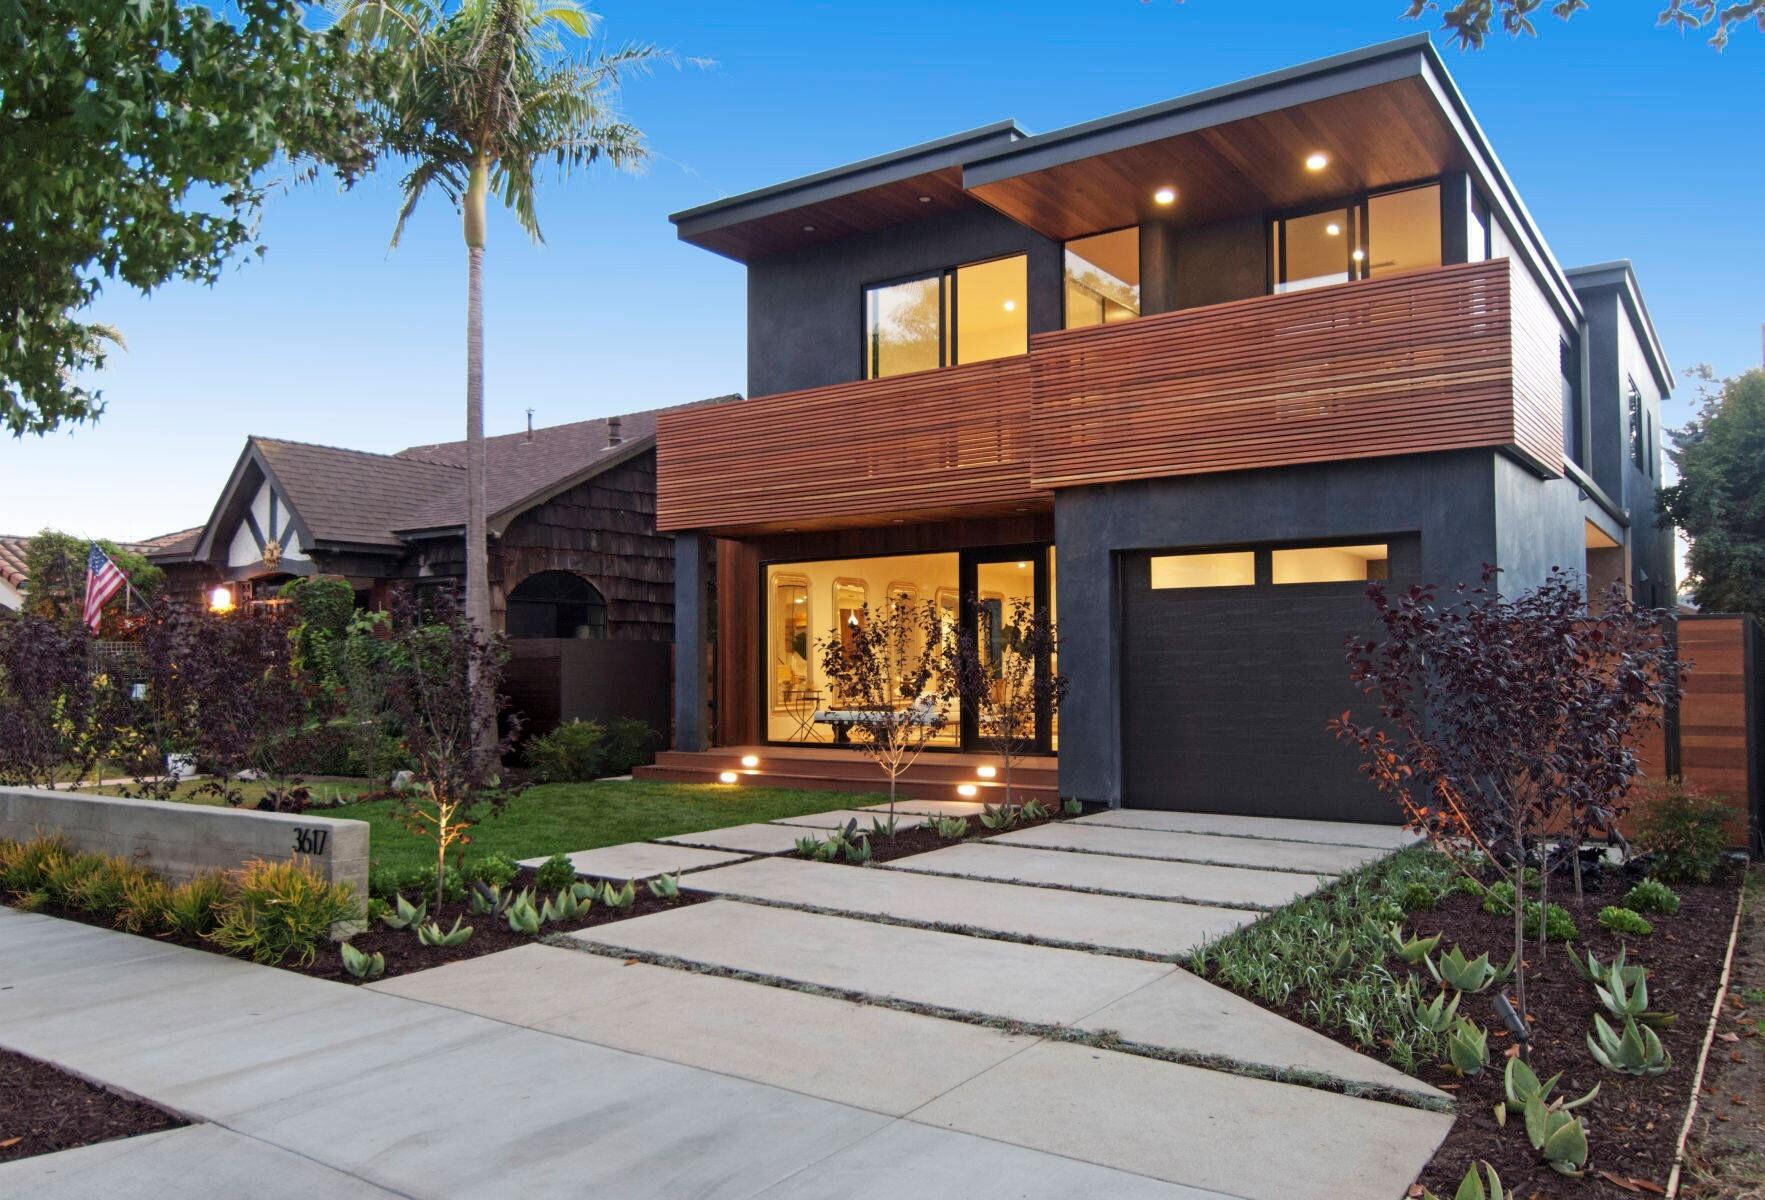 American Luxury Home Wallpaper Hd Wallpapers